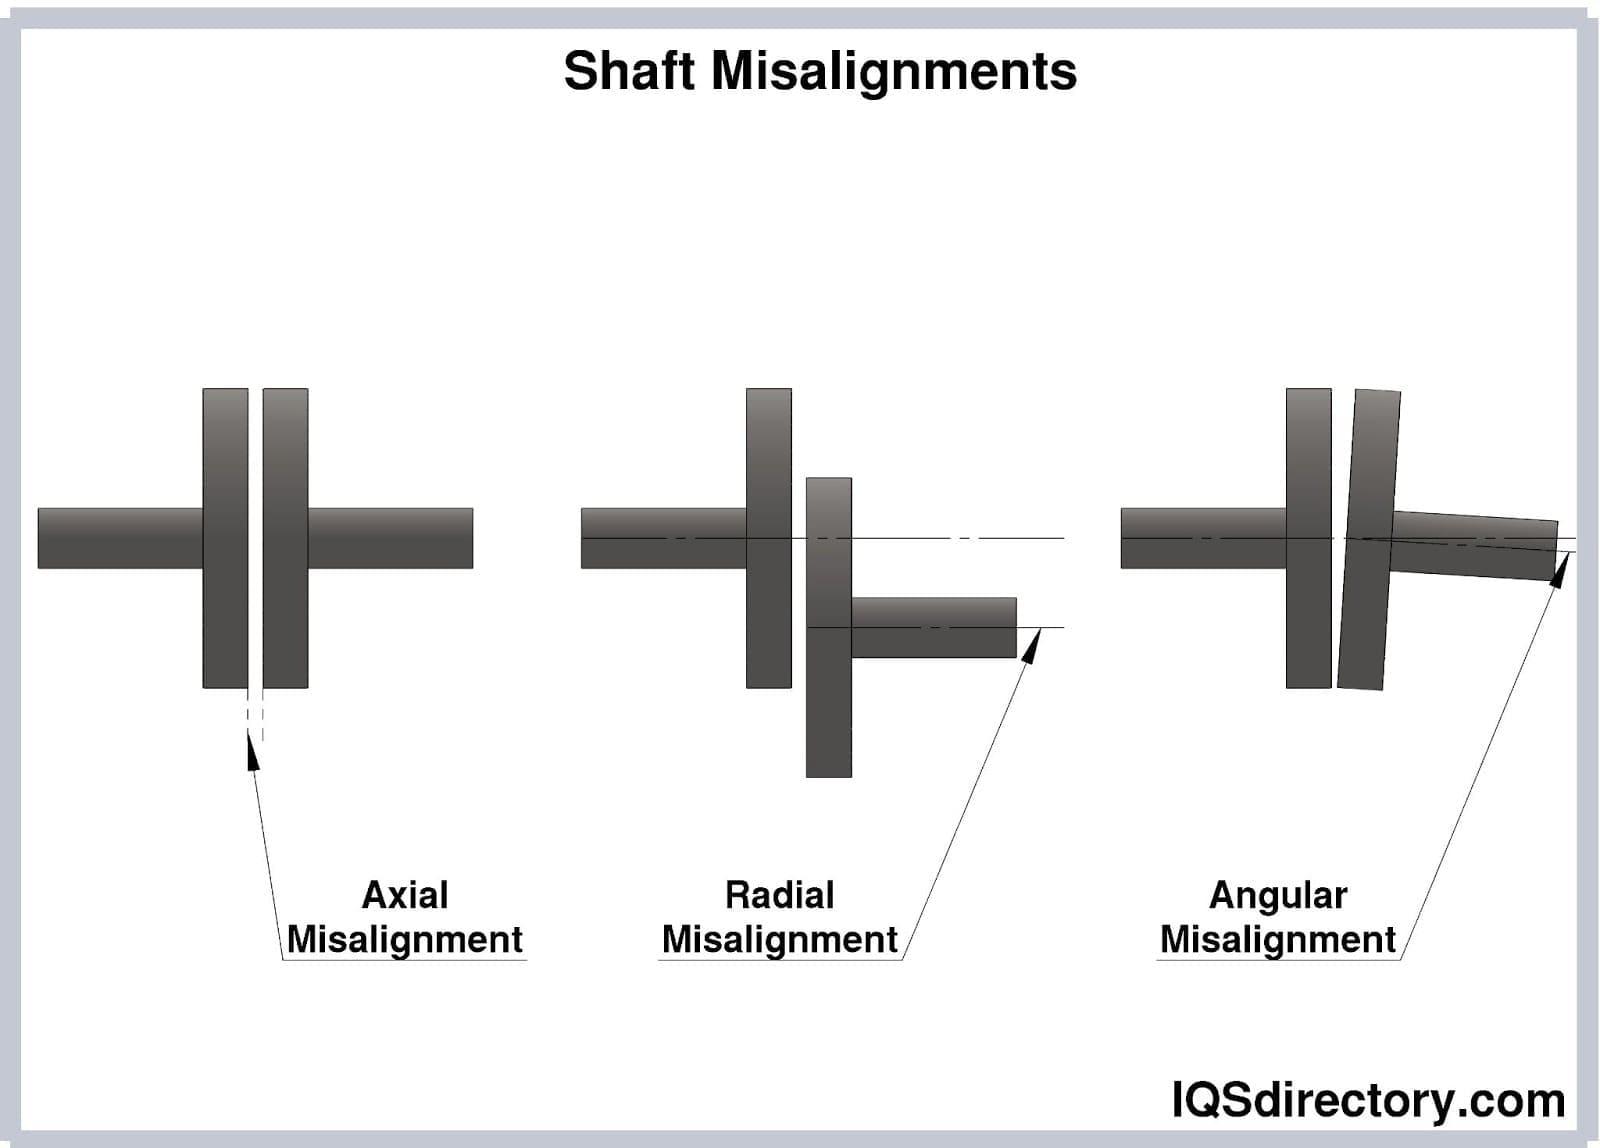 Shaft Misalignments